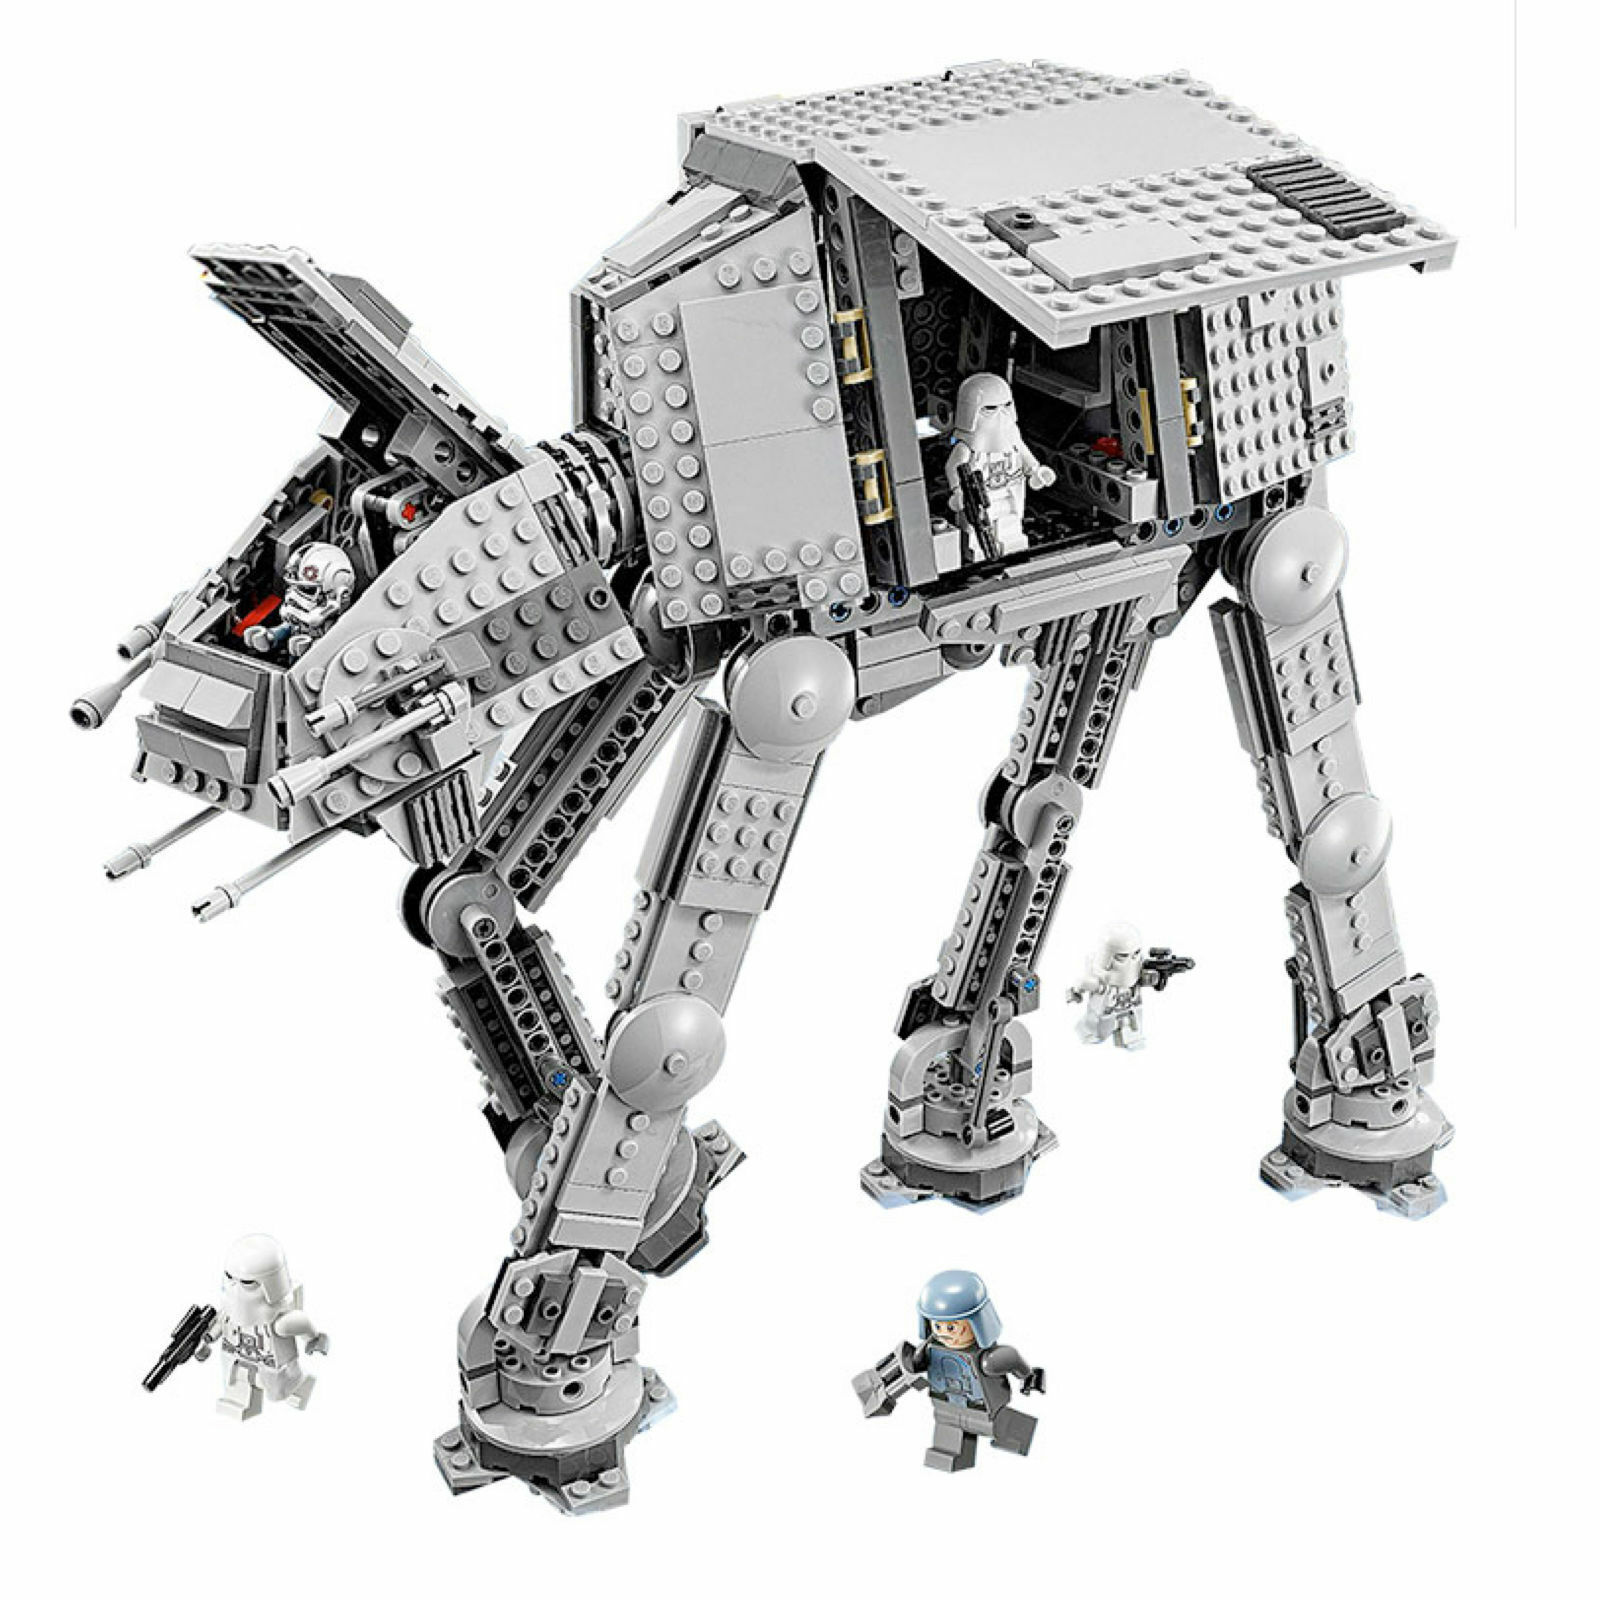 05051 Star Wars Series Force AWAK AT-AT Armed Building Blocks Bricks